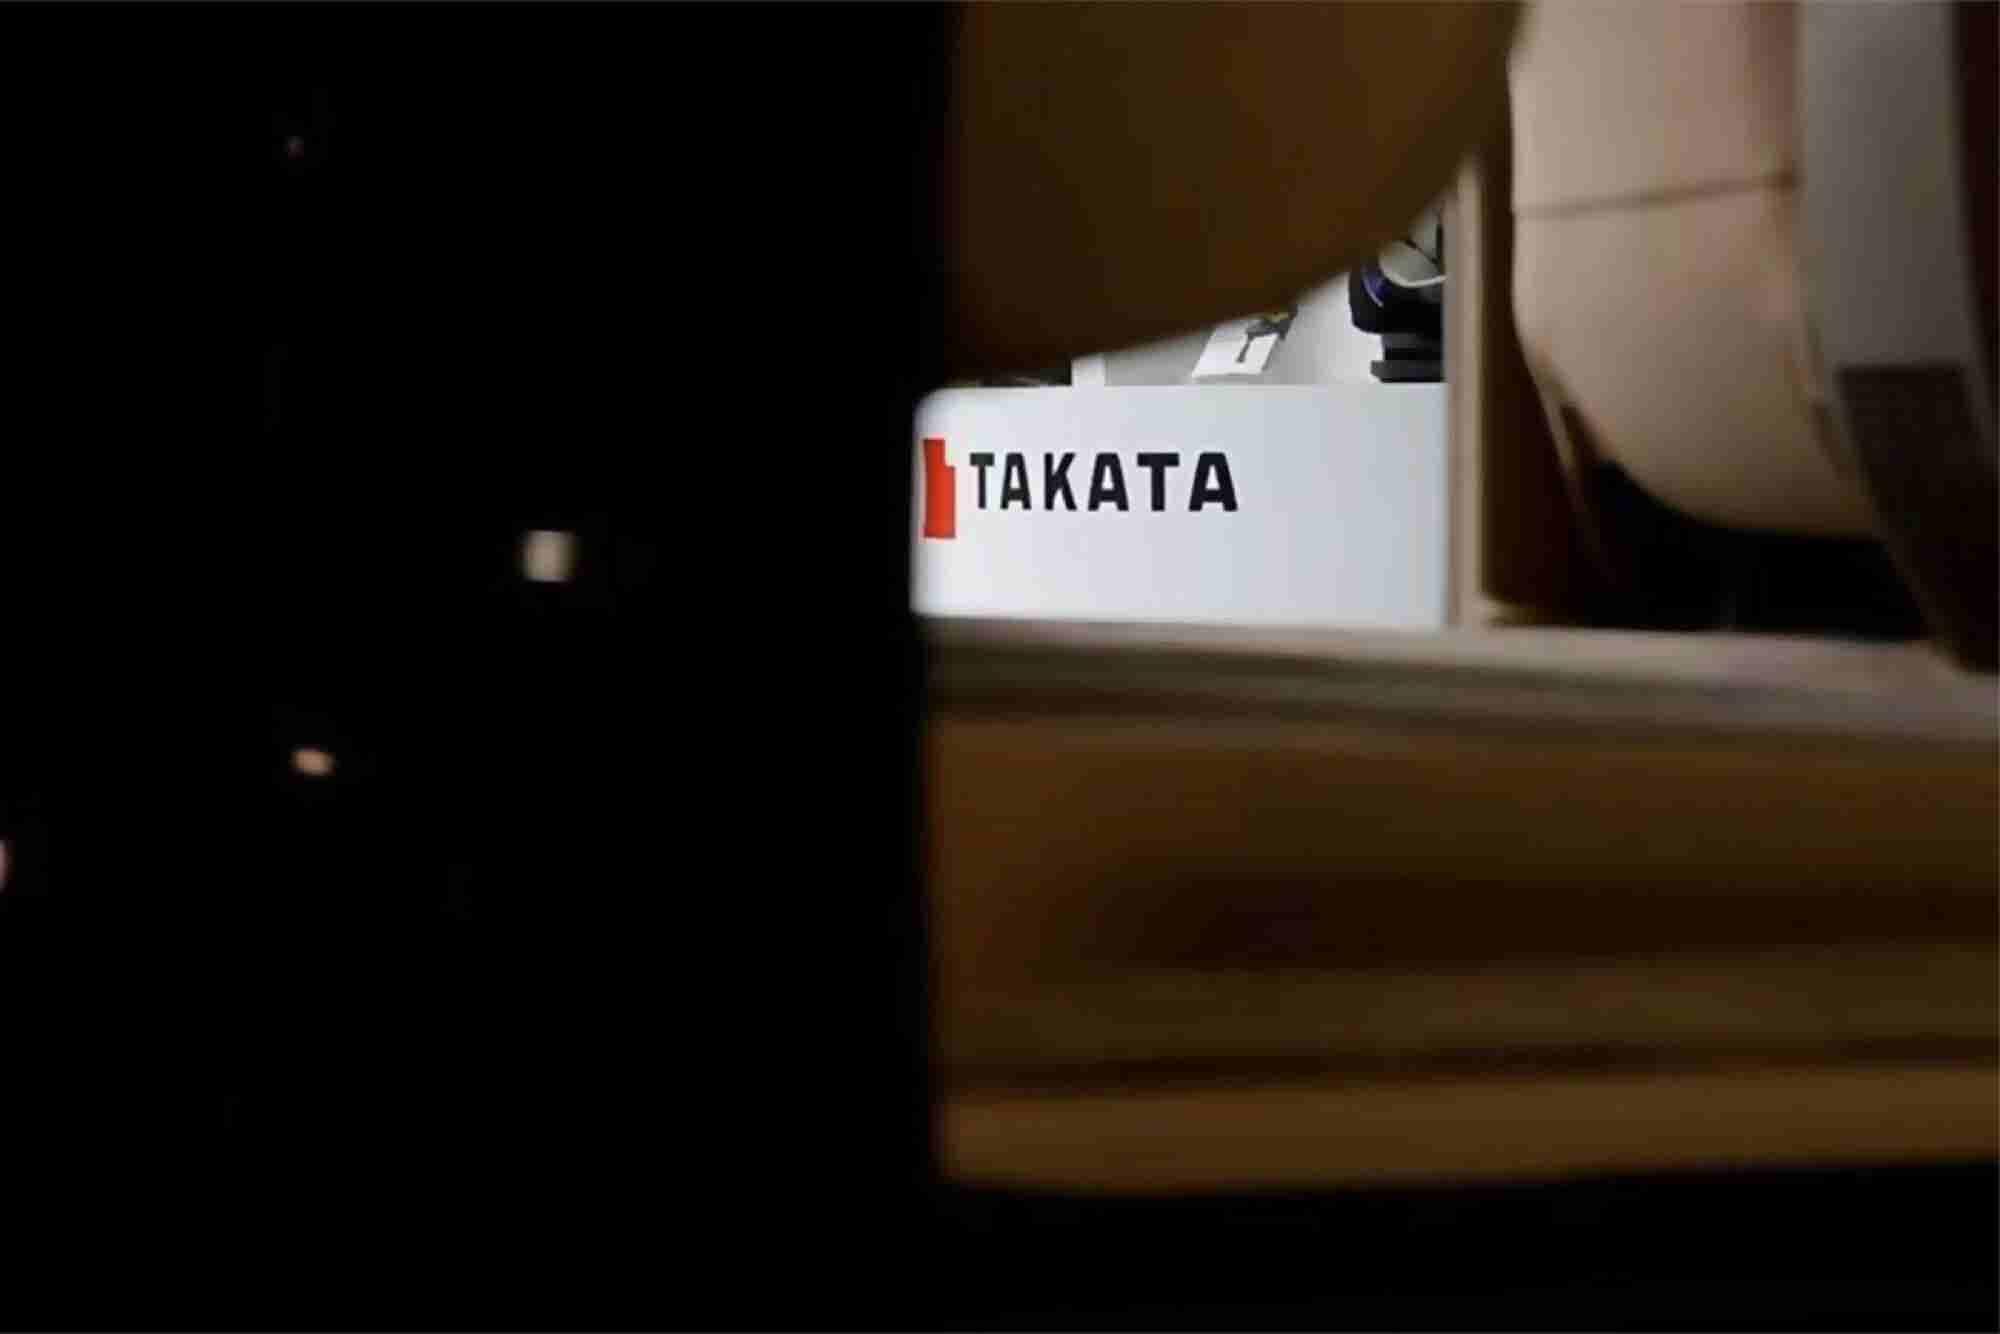 Truck Carrying Takata Air Bag Inflators Explodes in U.S., Killing One